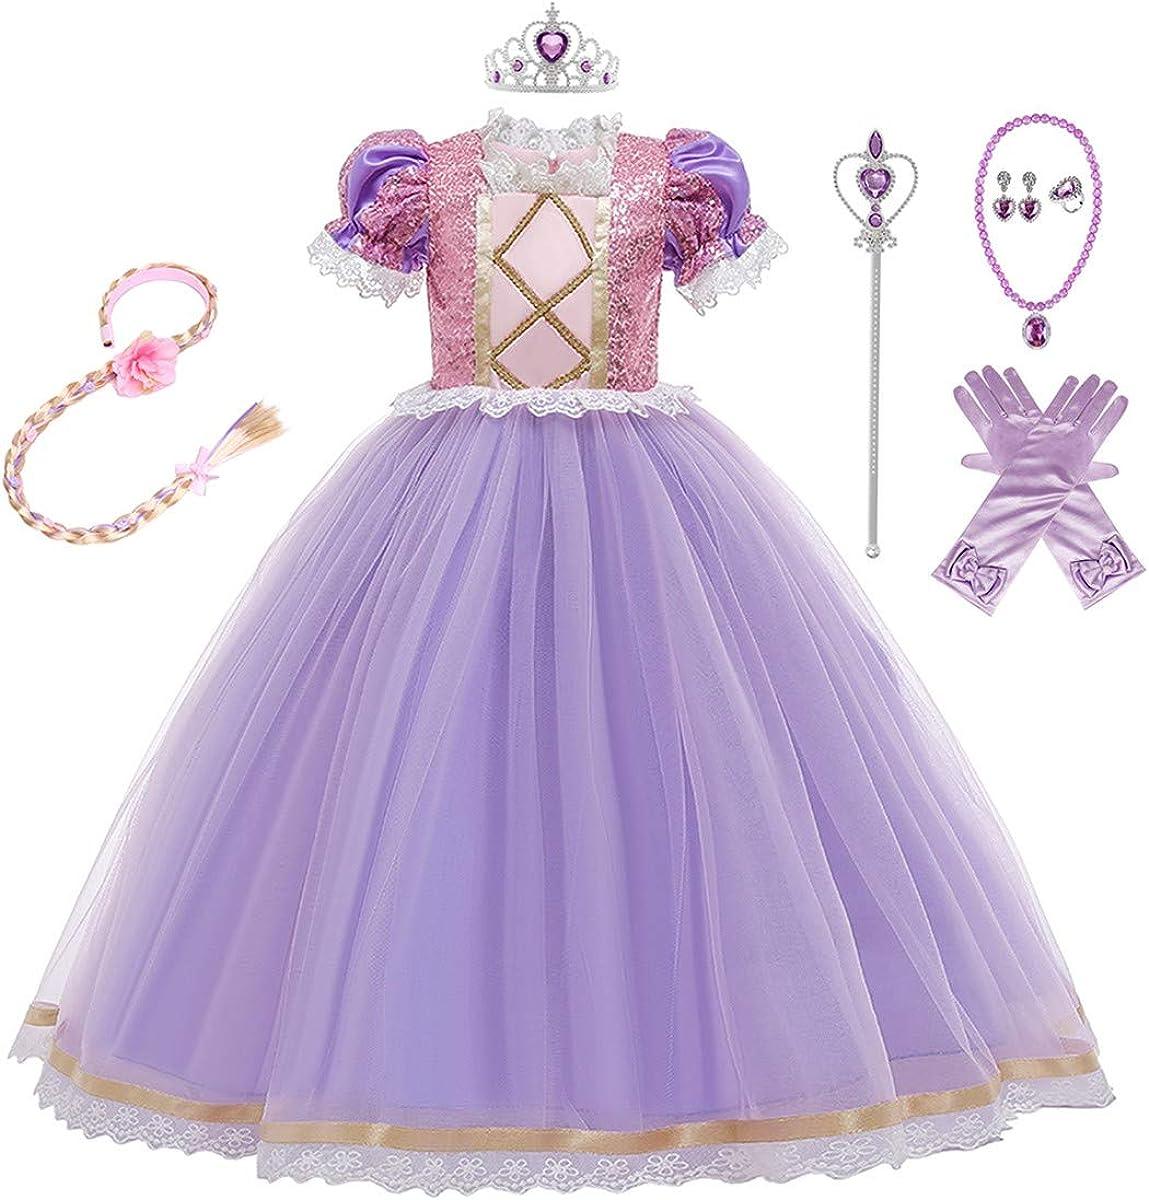 MYRISAM Rapunzel Princess Halloween Dress Sofia Costume Deluxe Party Fancy Dress Up for Girls w//Gloves Jewelry Accessories